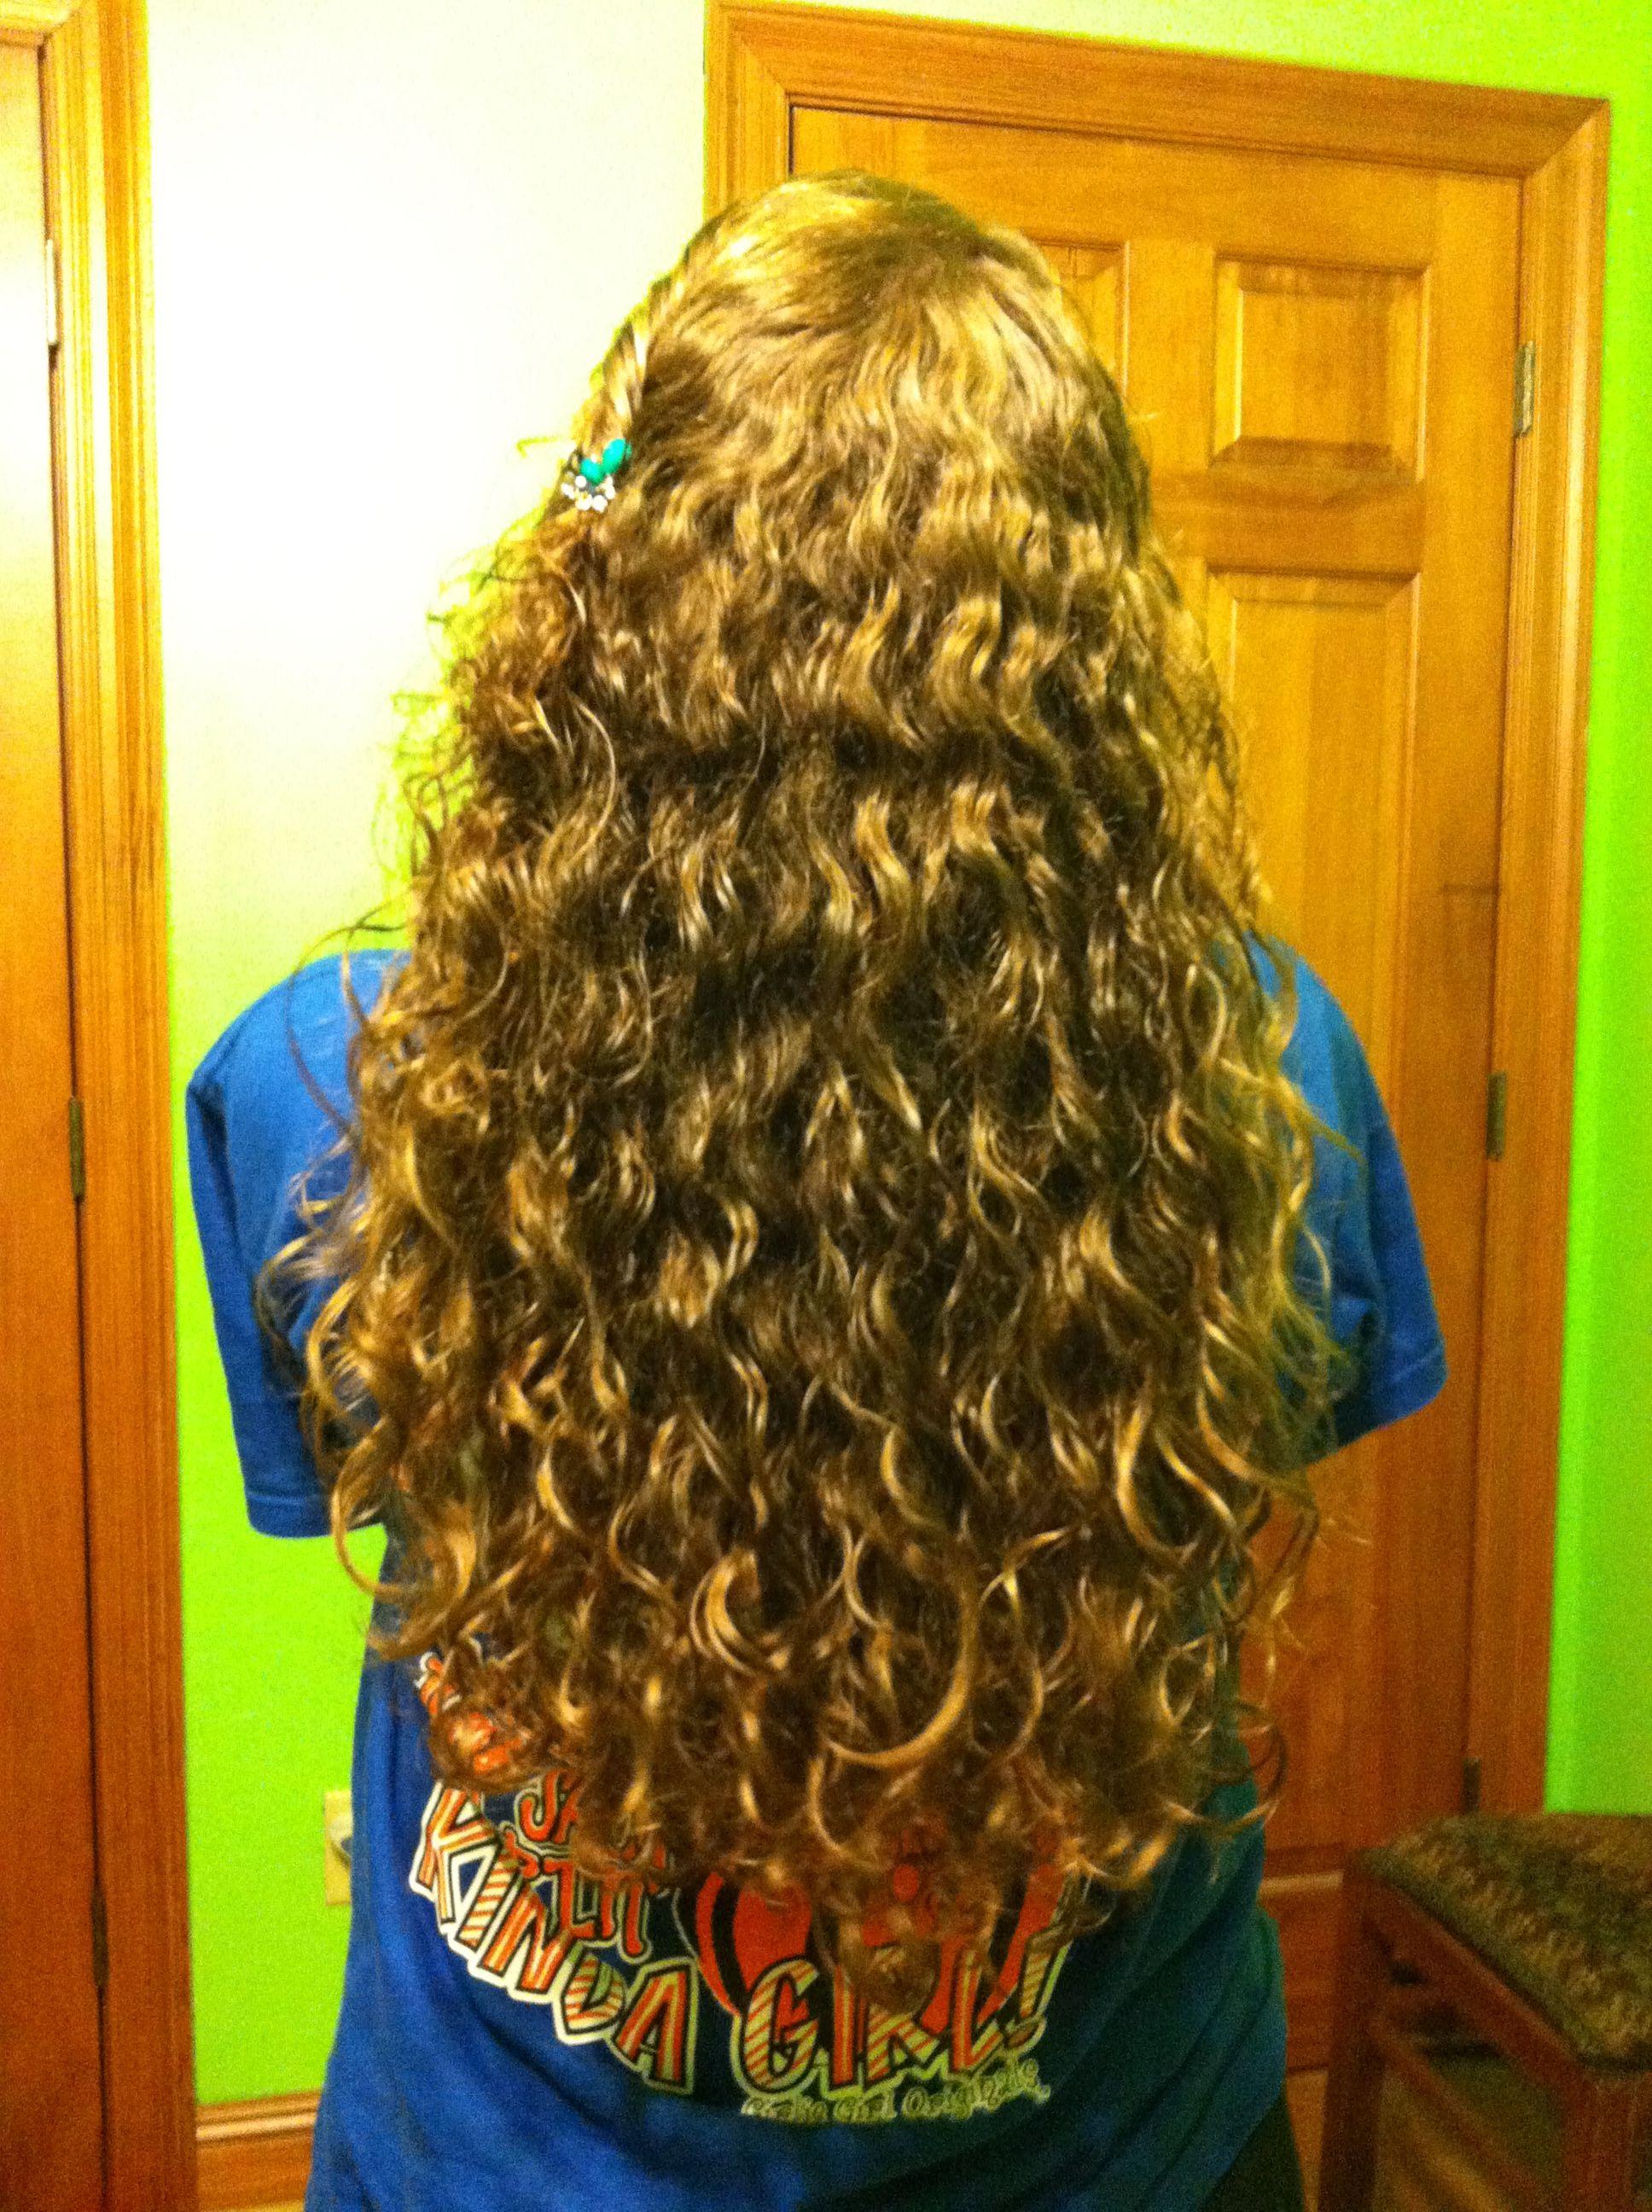 Curly hair!!!<3